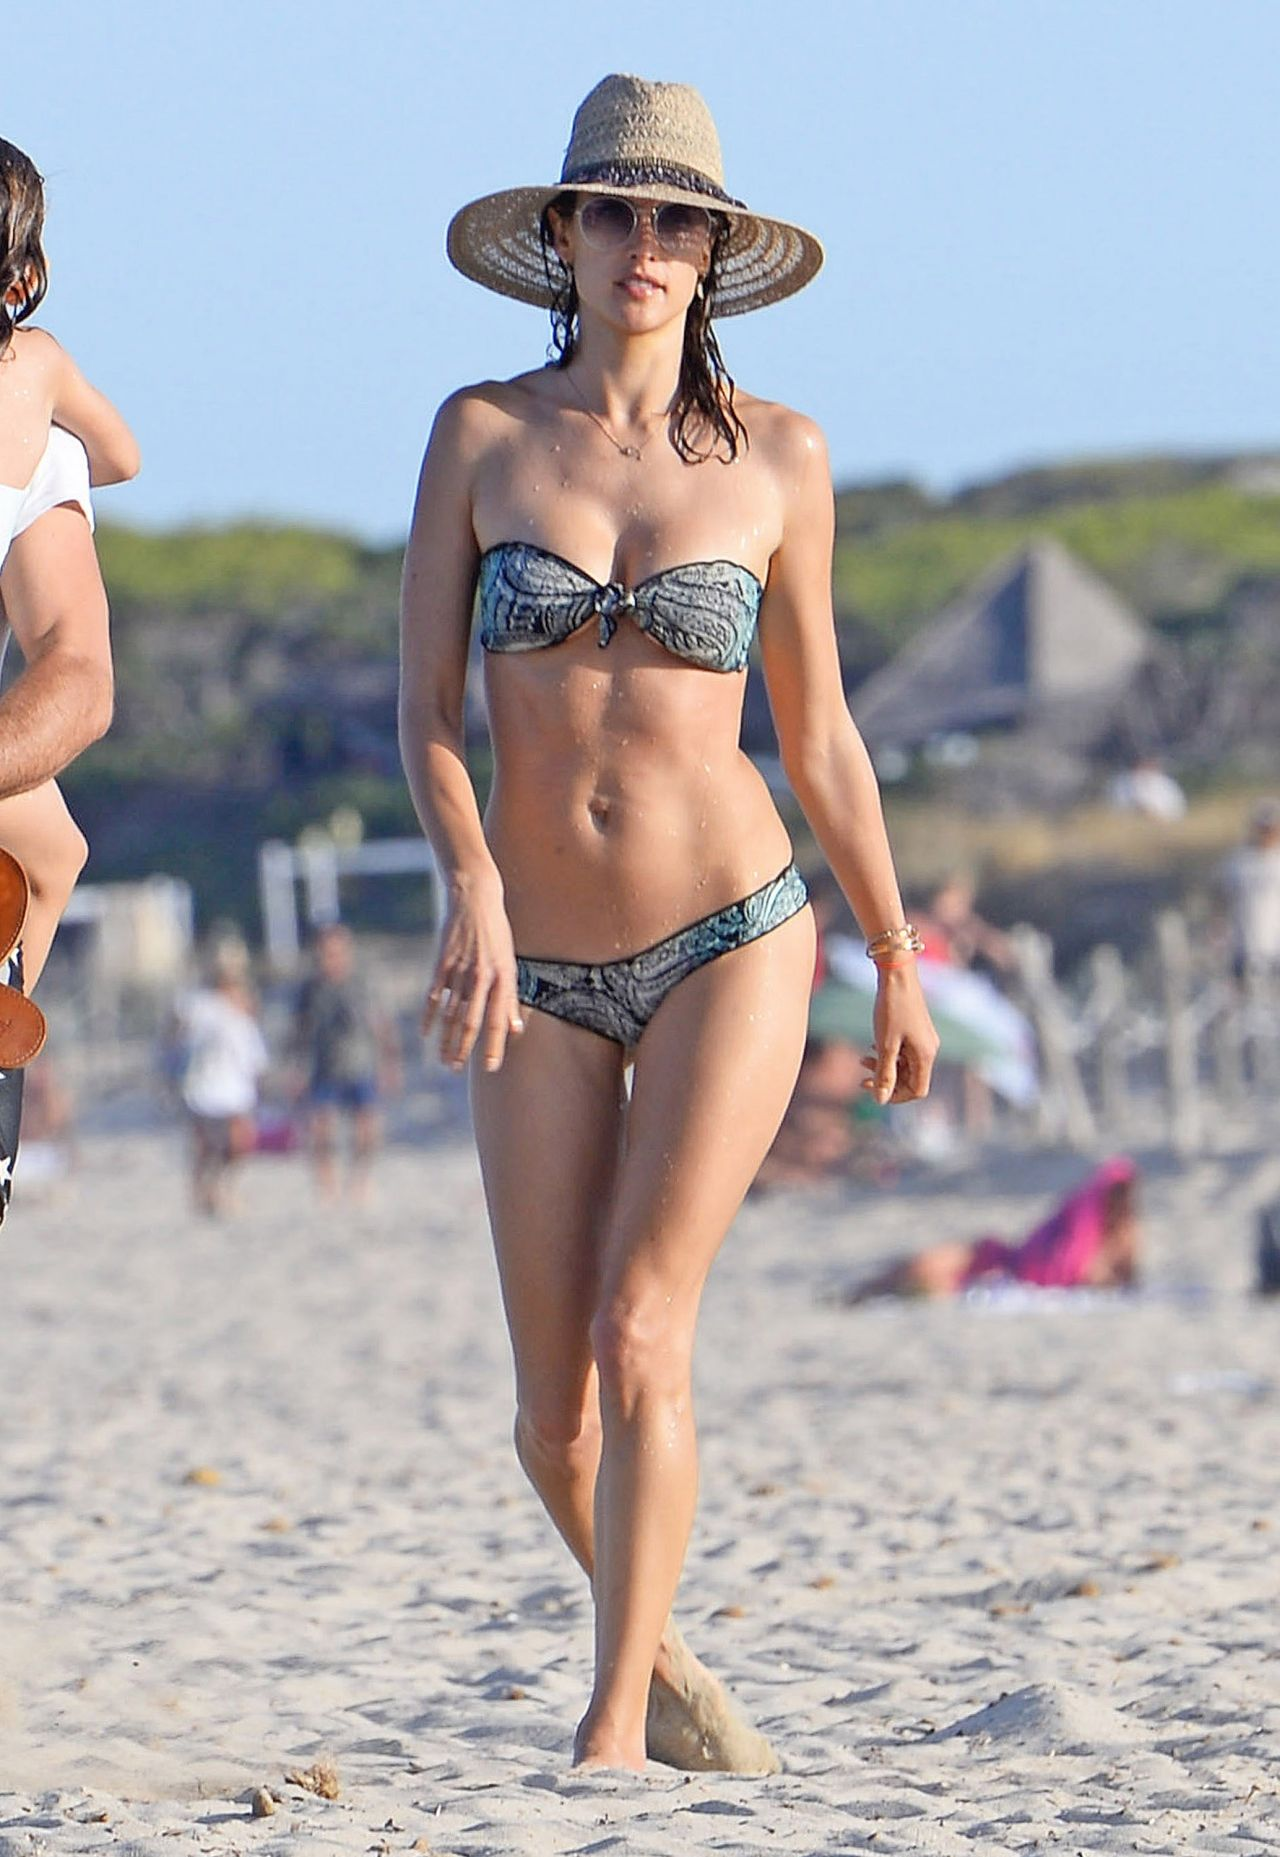 Alessandra Ambrosio Bikini Bodies Pic 20 of 35